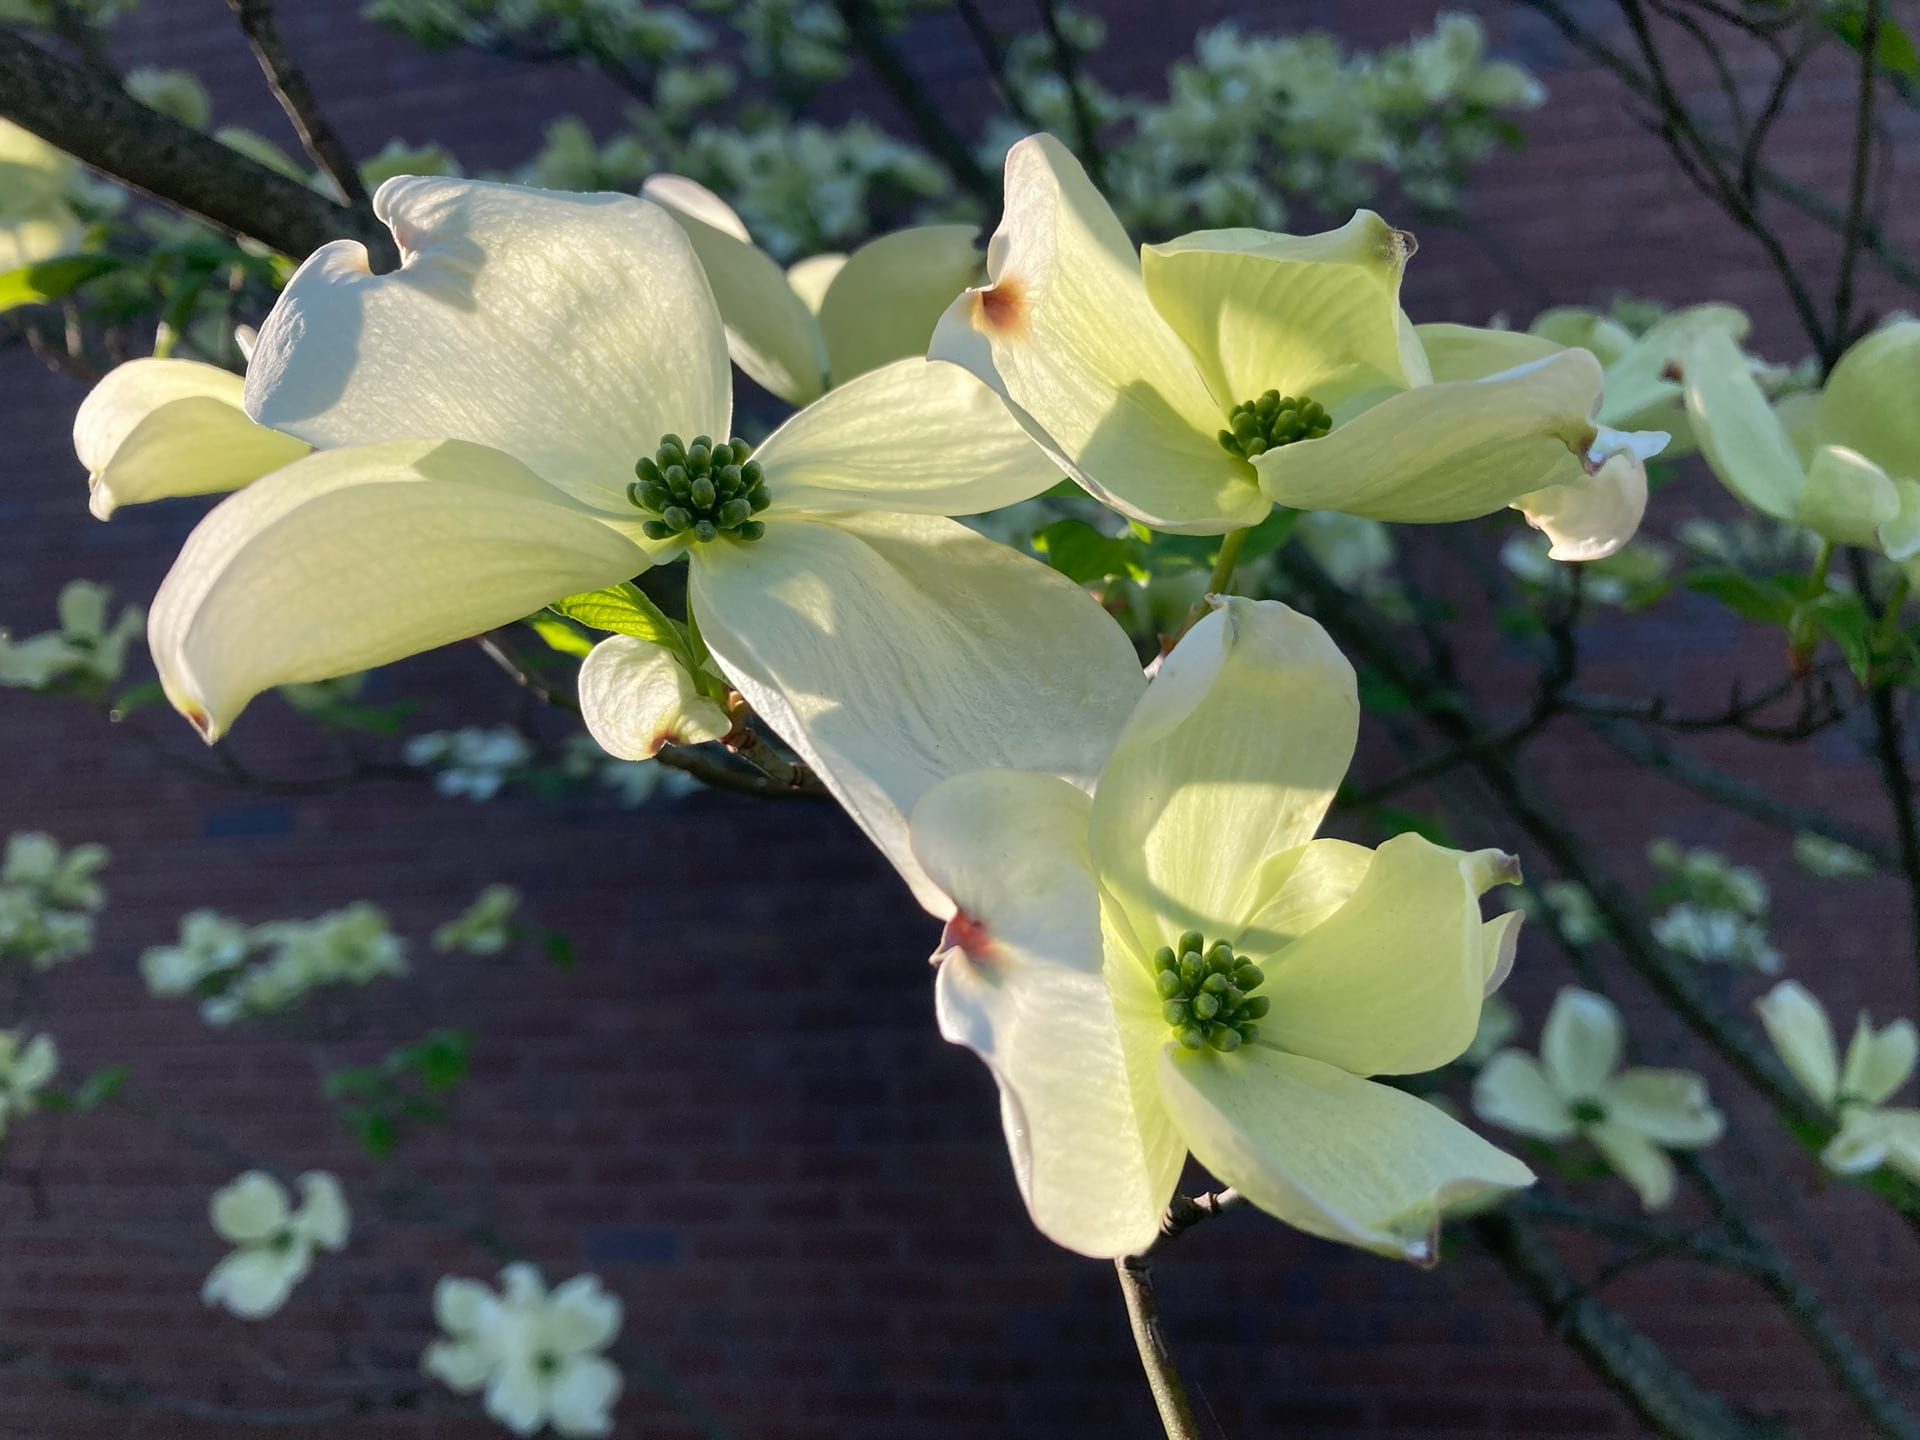 Flowers of Cornus florida, illuminated by April morning sunshine.